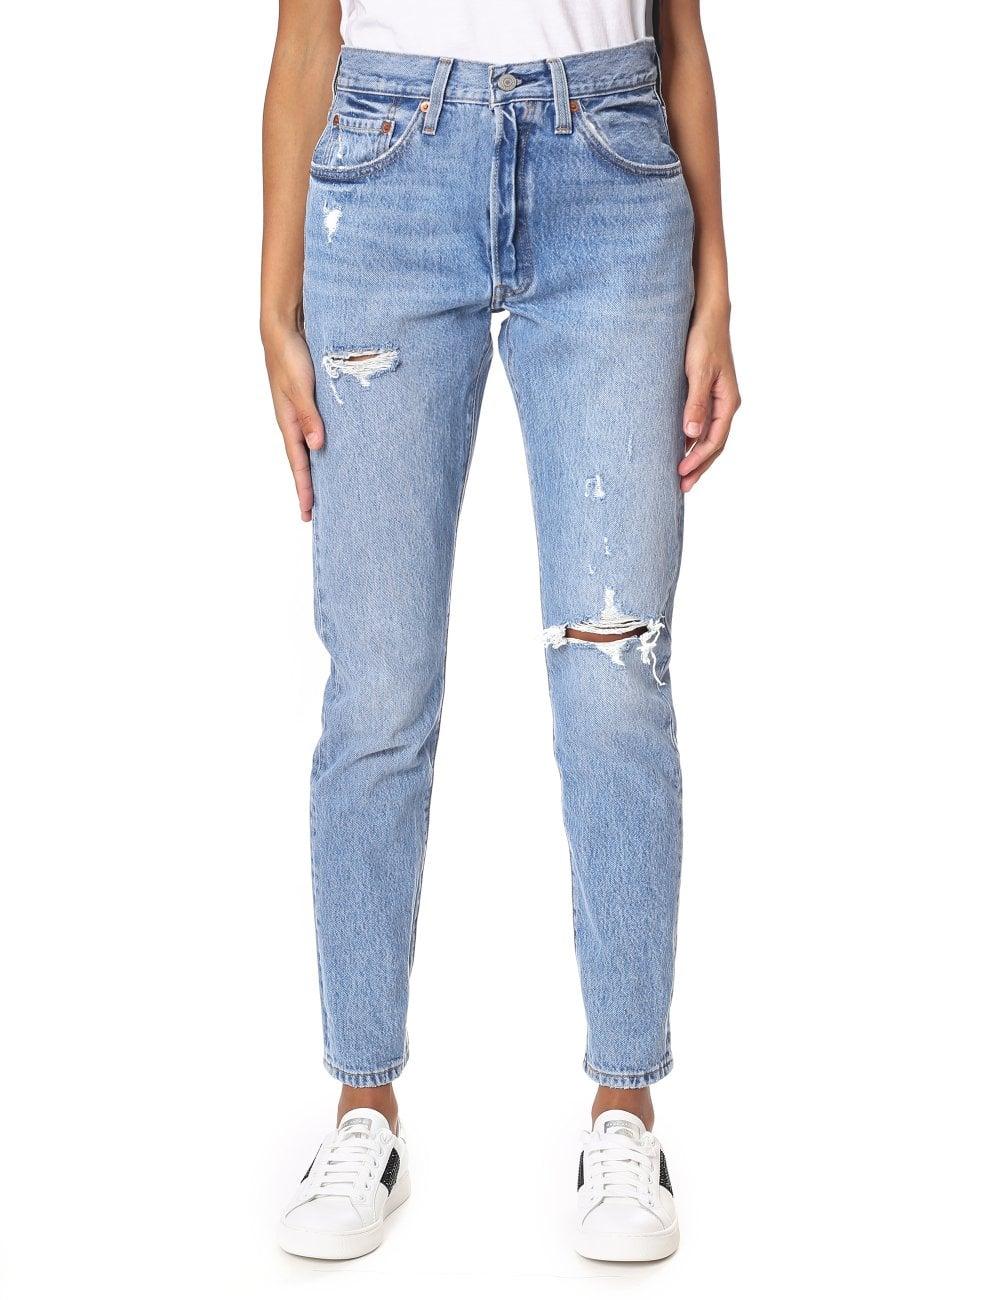 38a604b6276 Levi's Women's 501 Skinny Fit Jeans